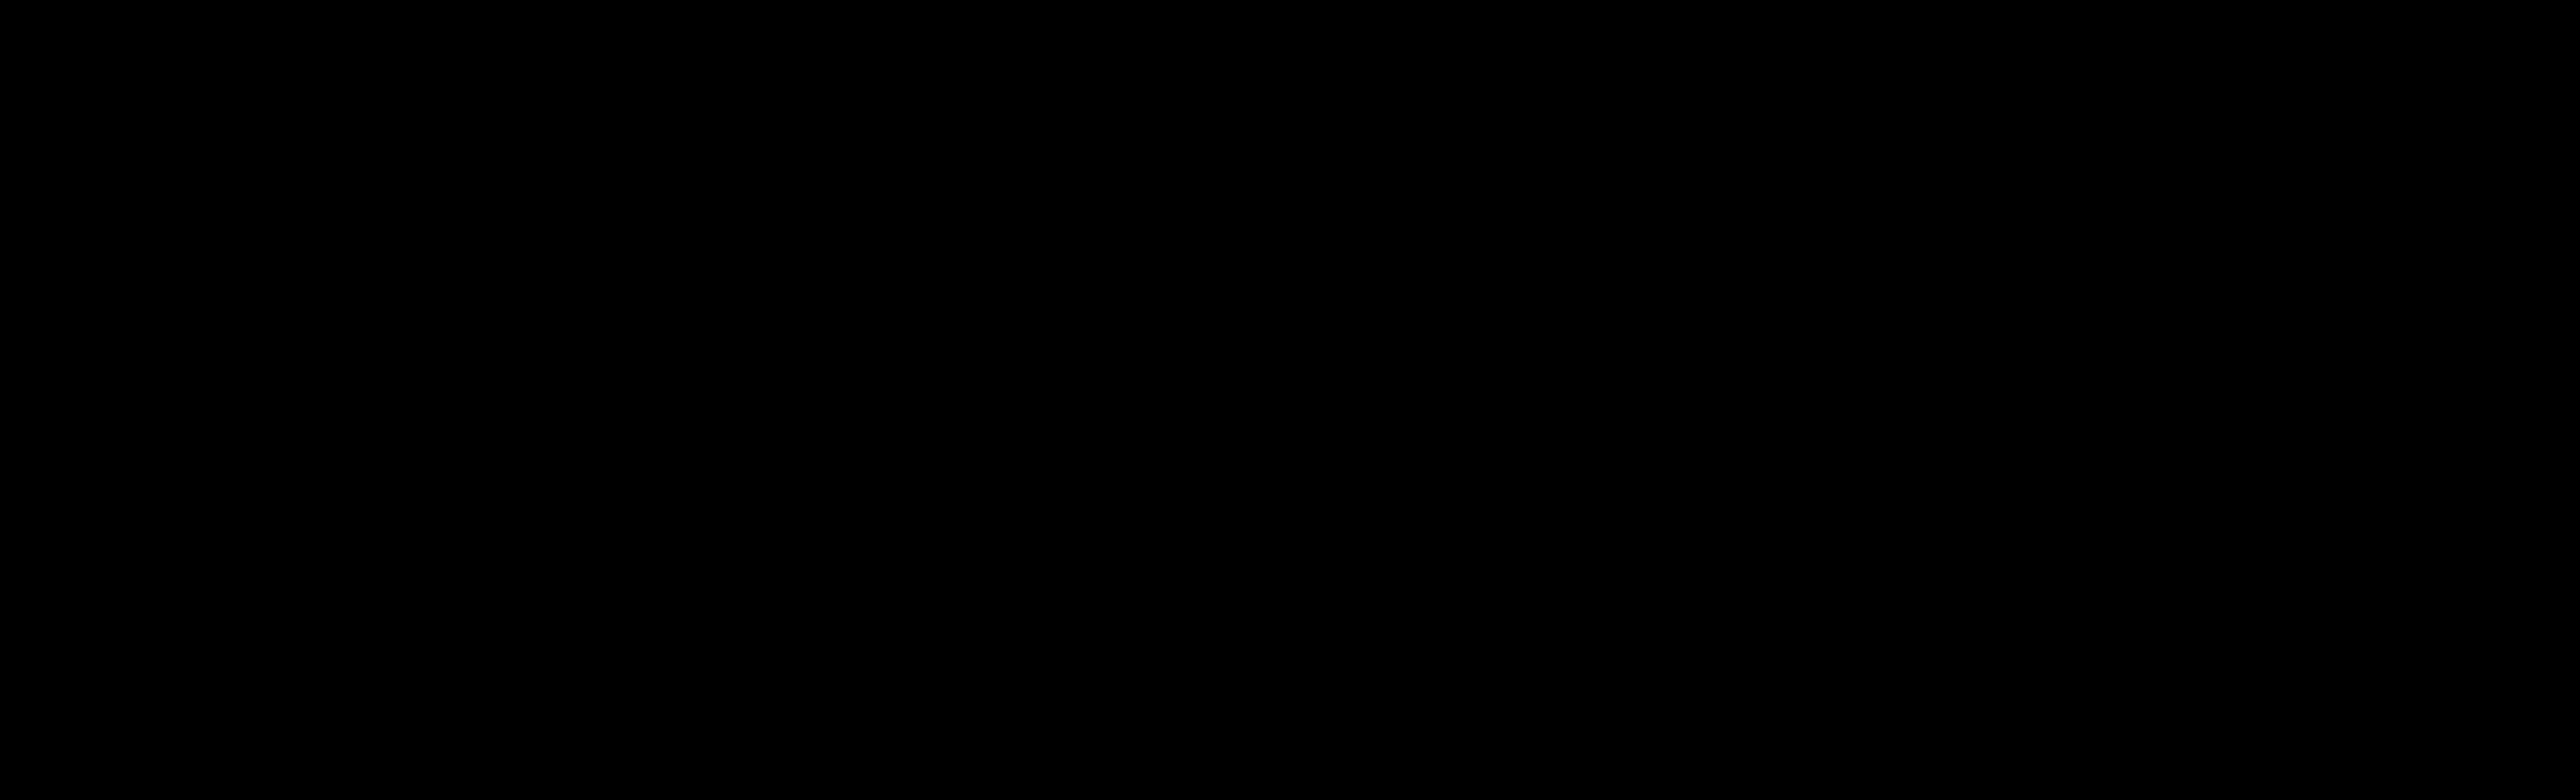 Eden Feathers Logo Black PNG